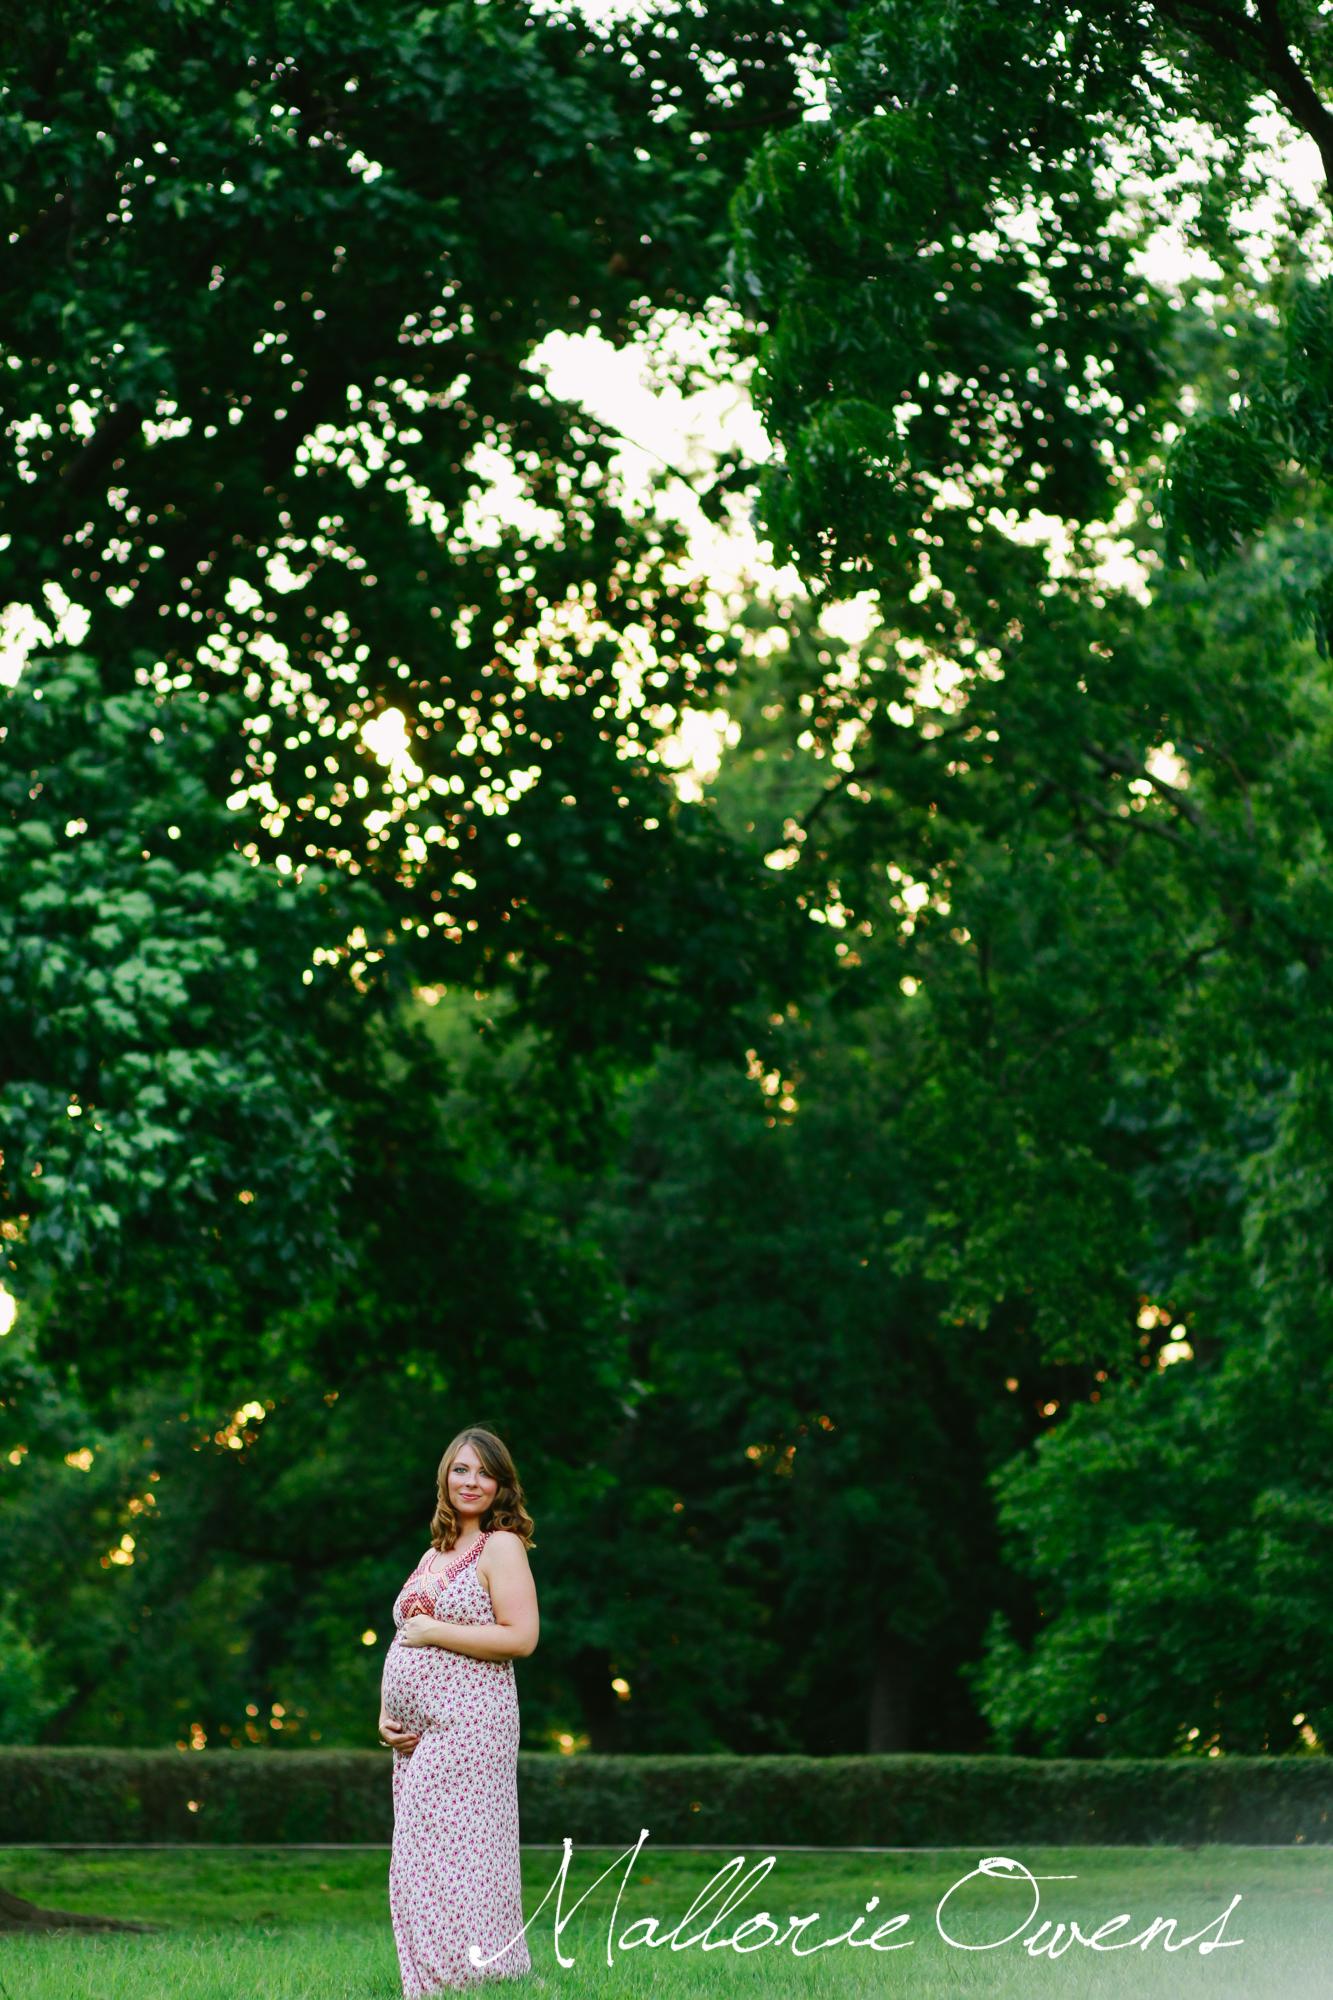 Fine Art Maternity Photos | Mallorie Owens